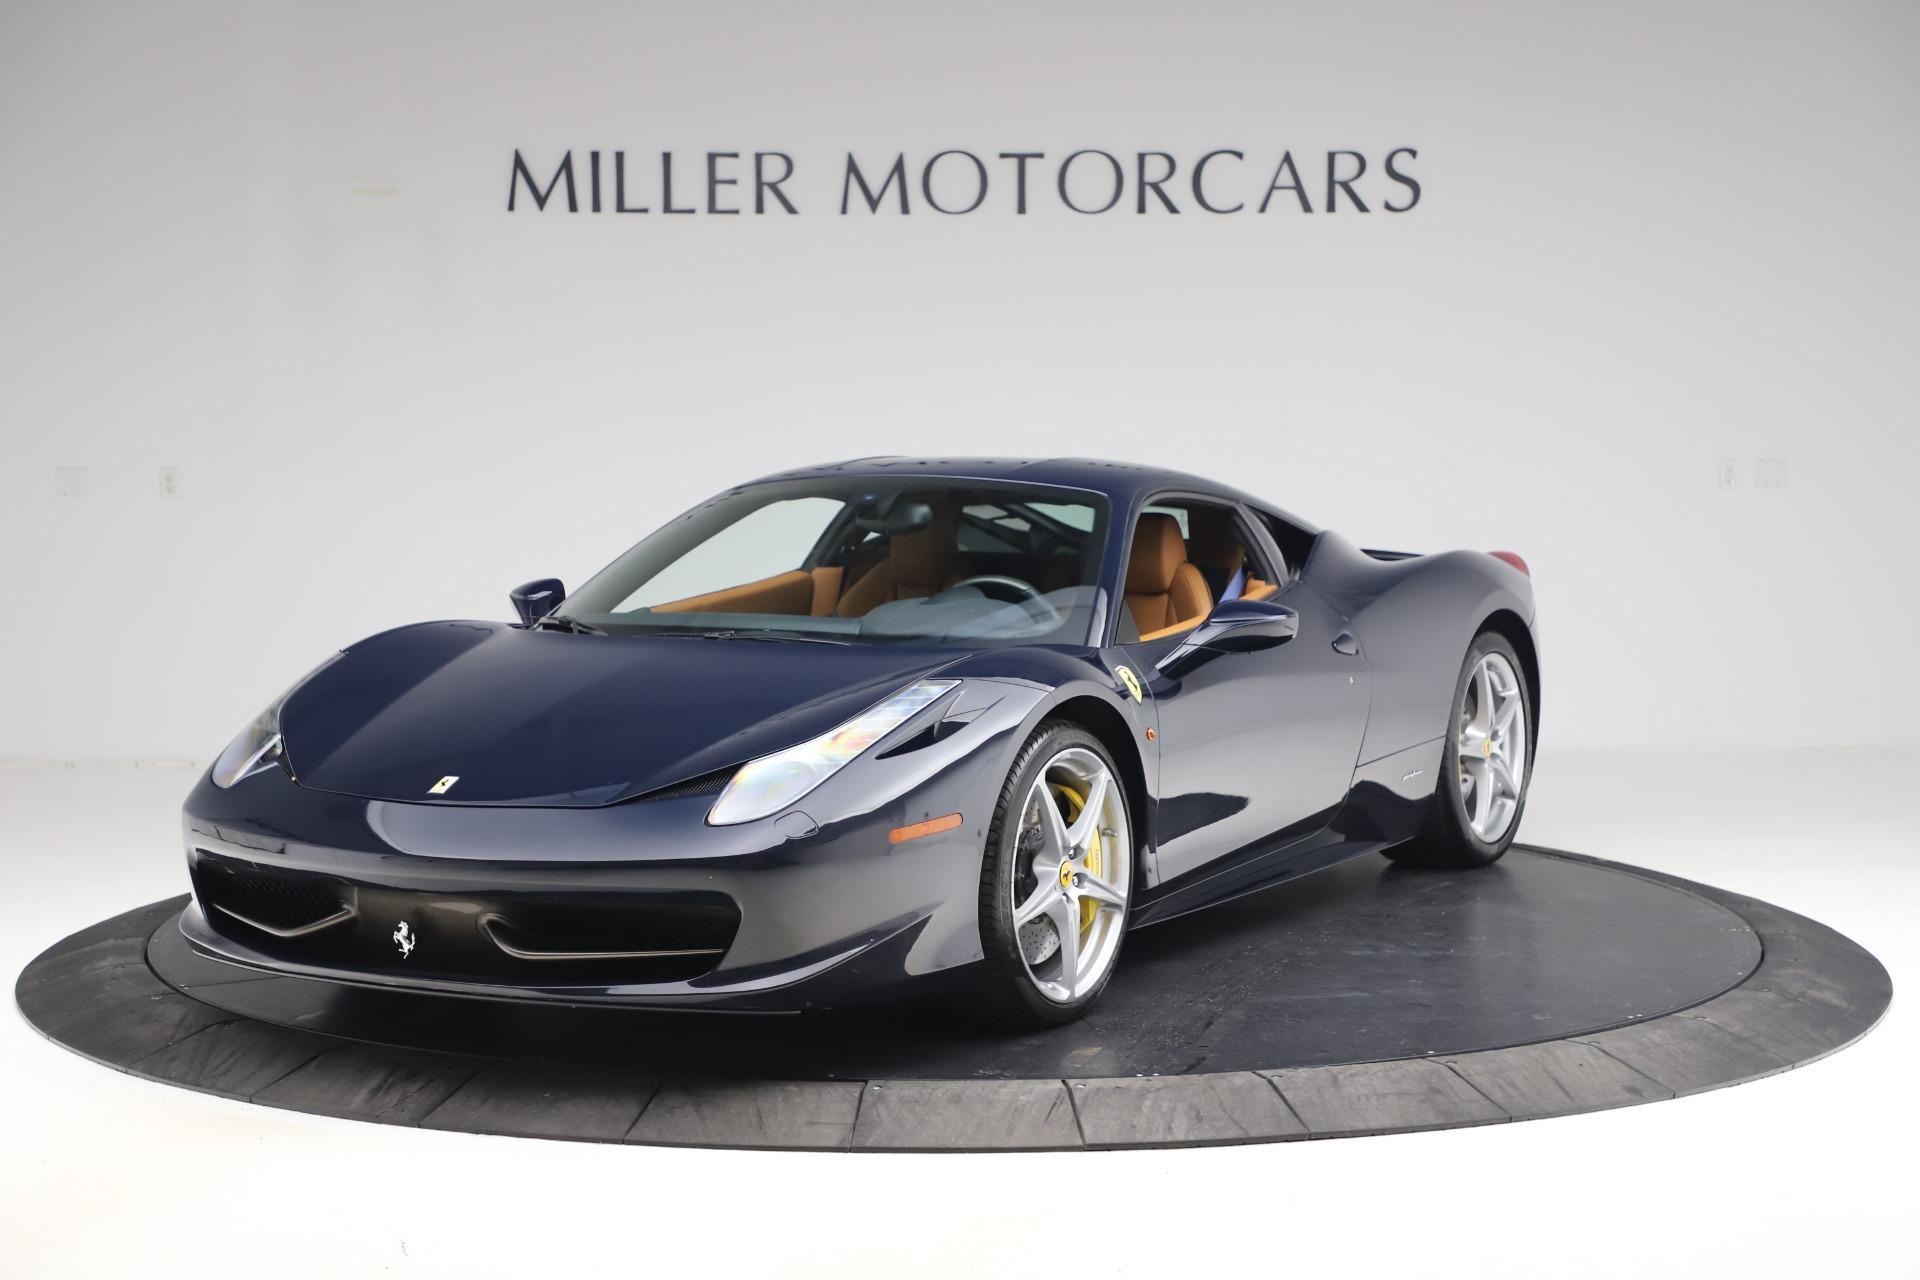 Used 2011 Ferrari 458 Italia for sale Sold at Pagani of Greenwich in Greenwich CT 06830 1